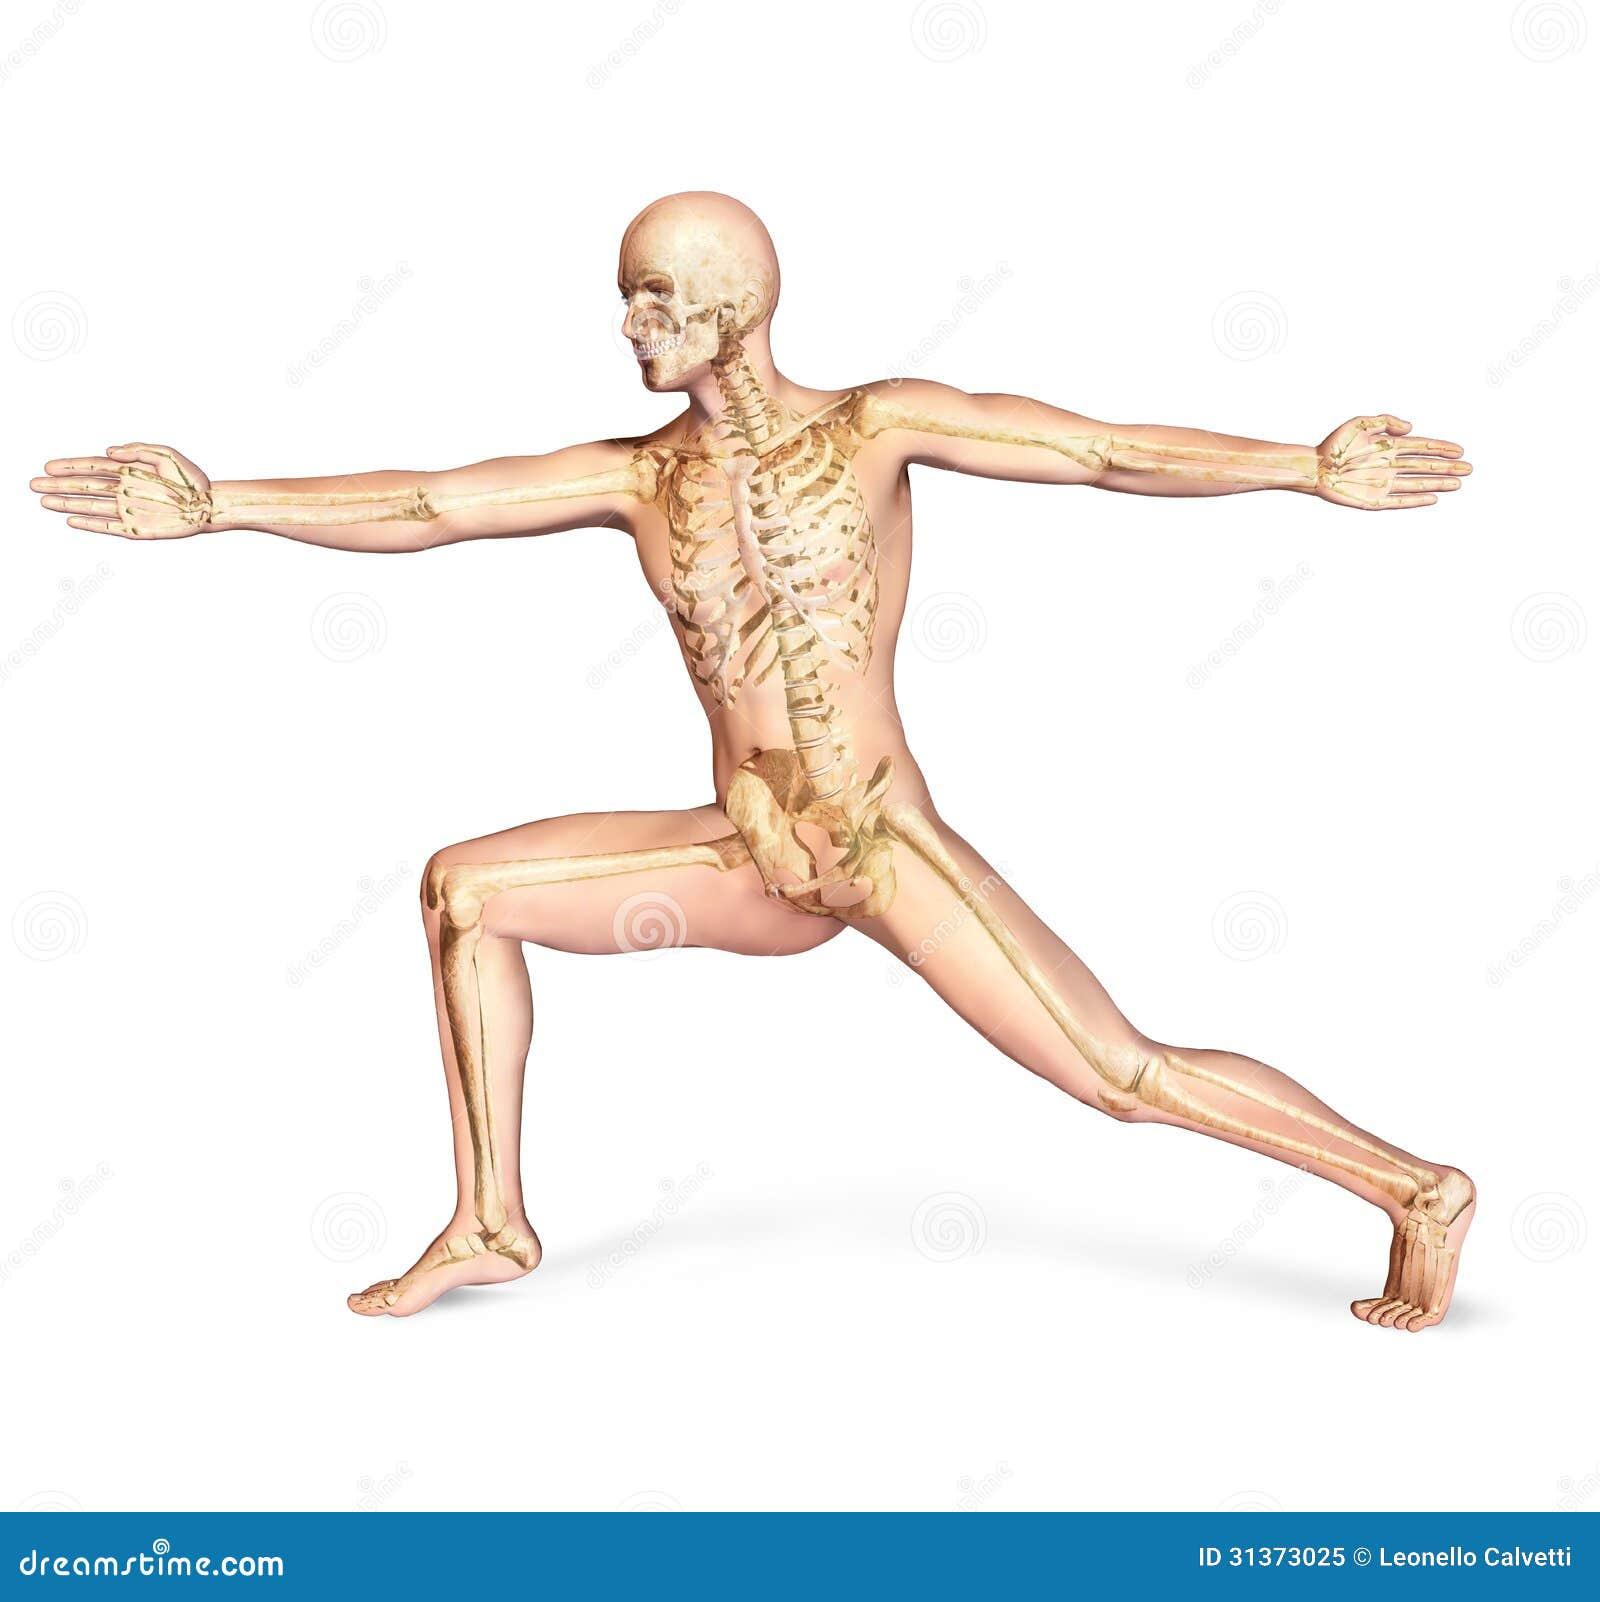 Skeletal Posture Pictures 27